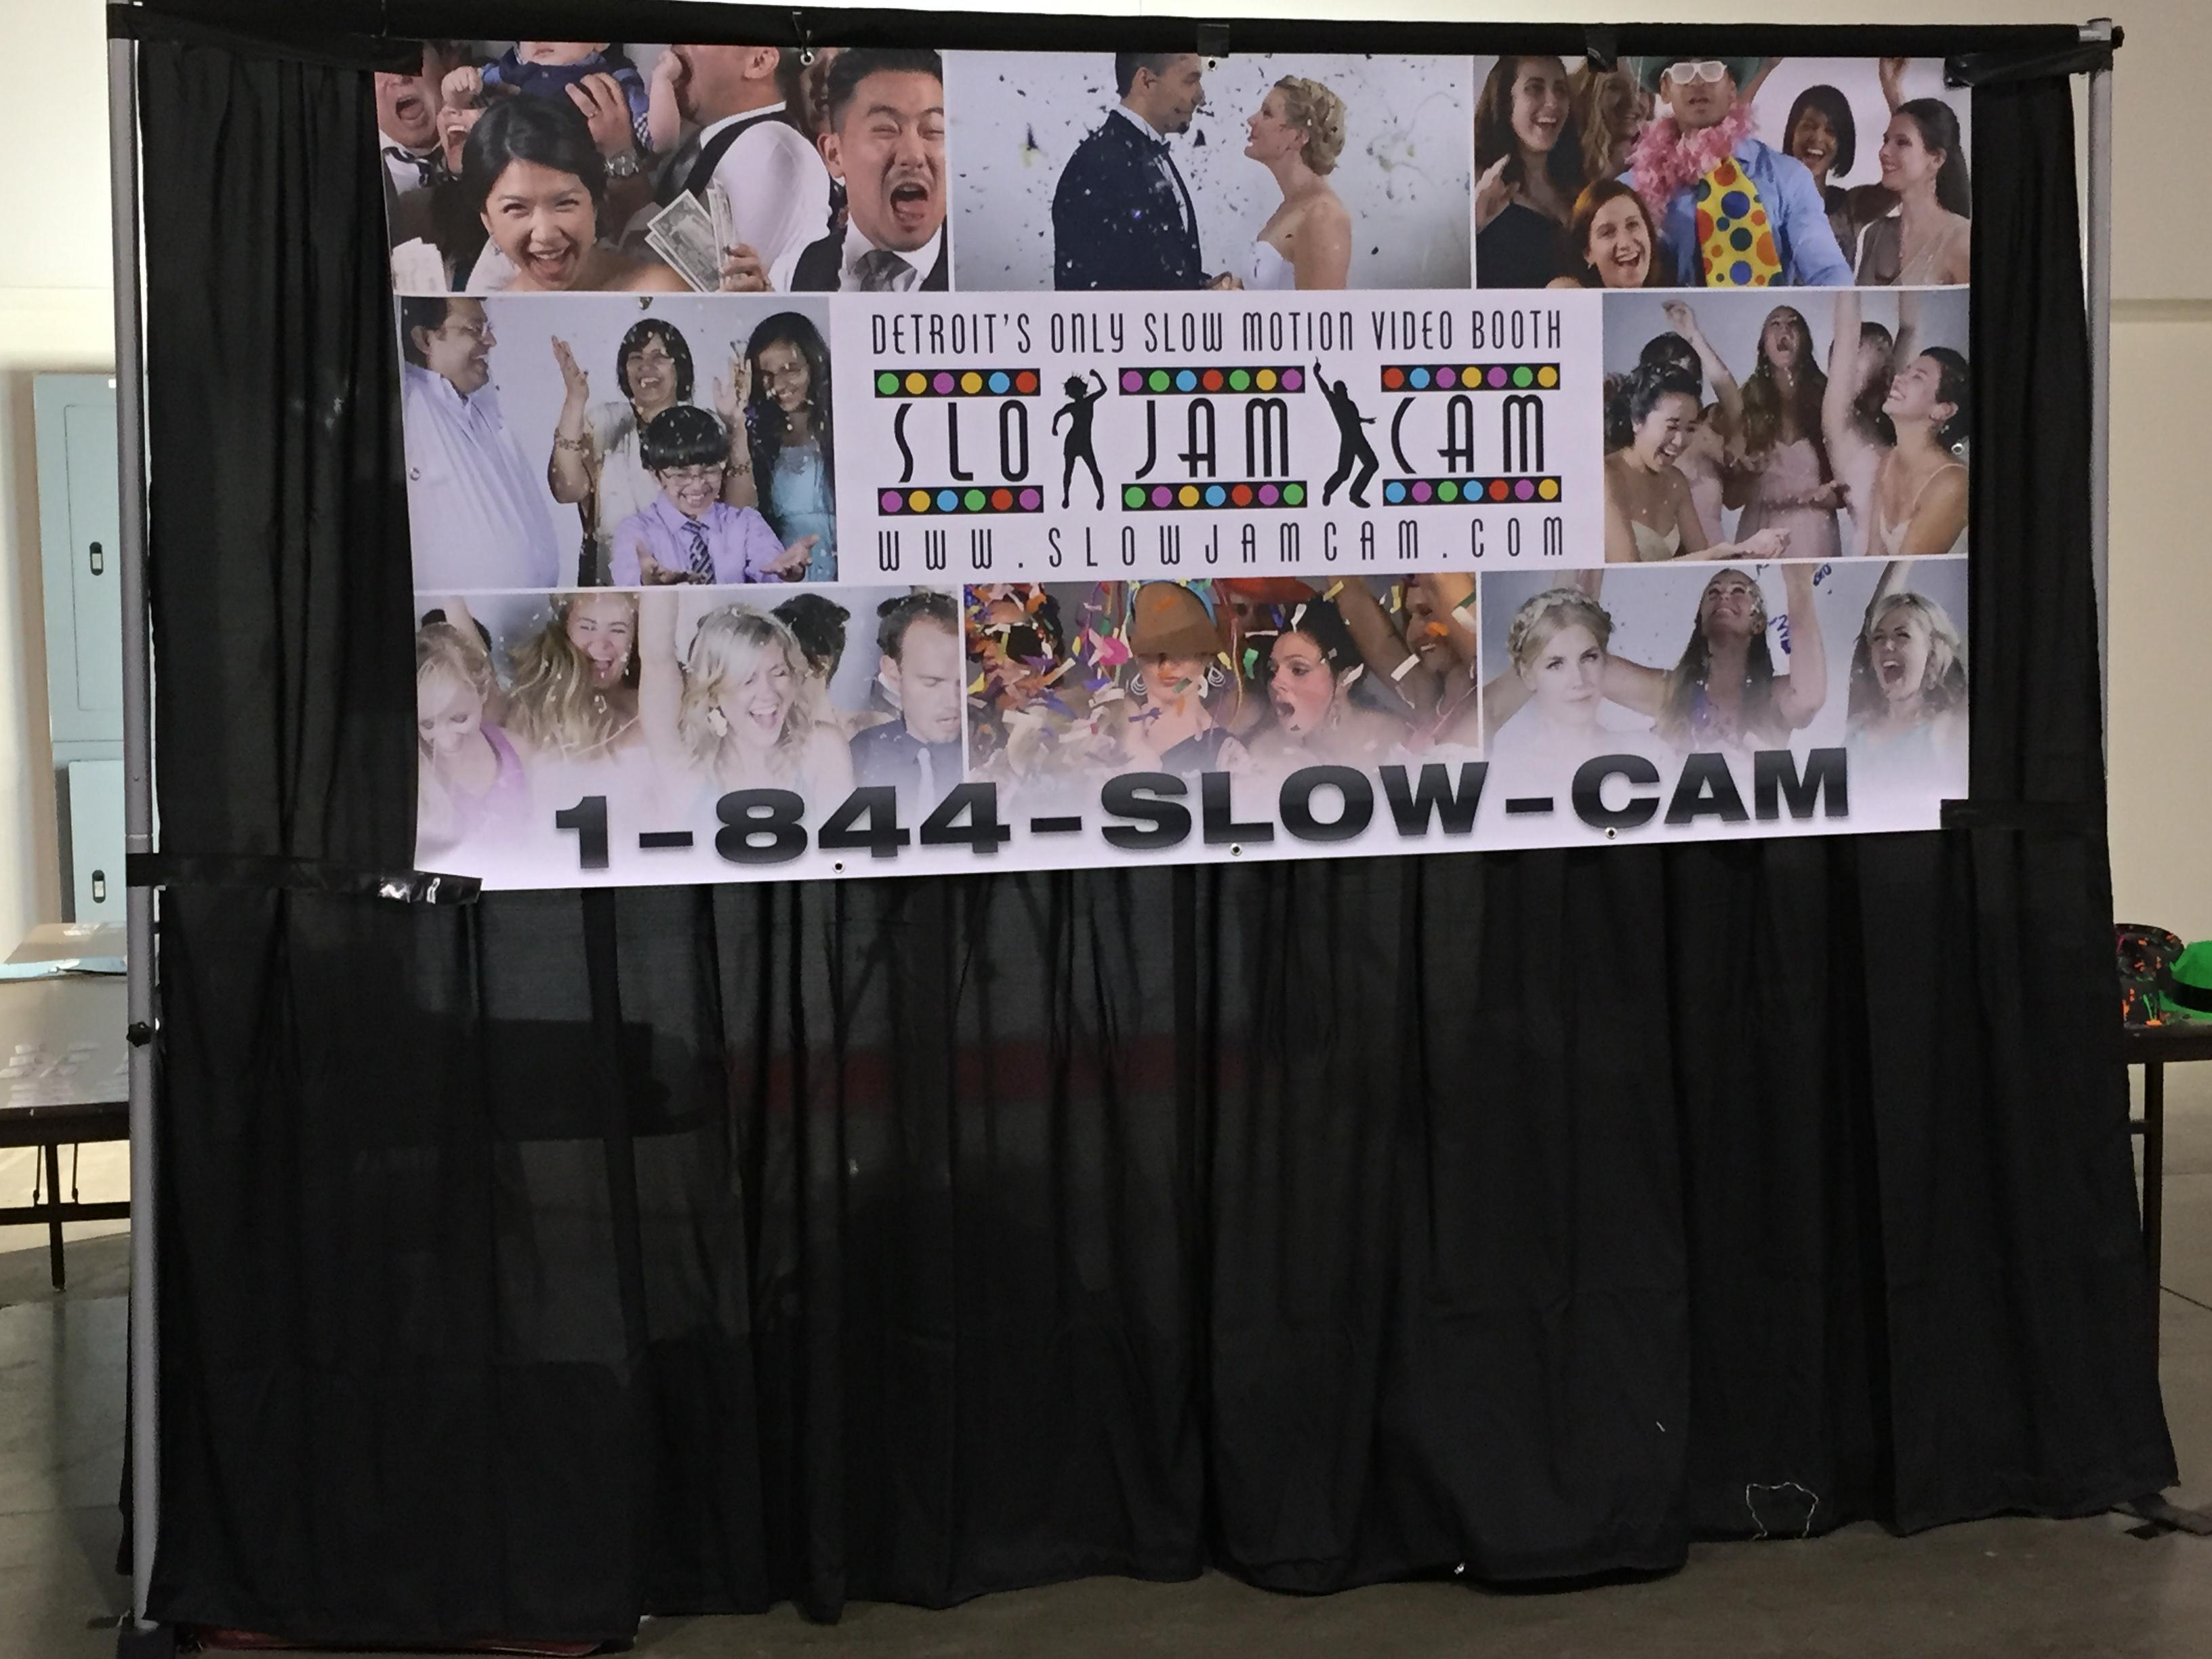 Slow Jam Cam